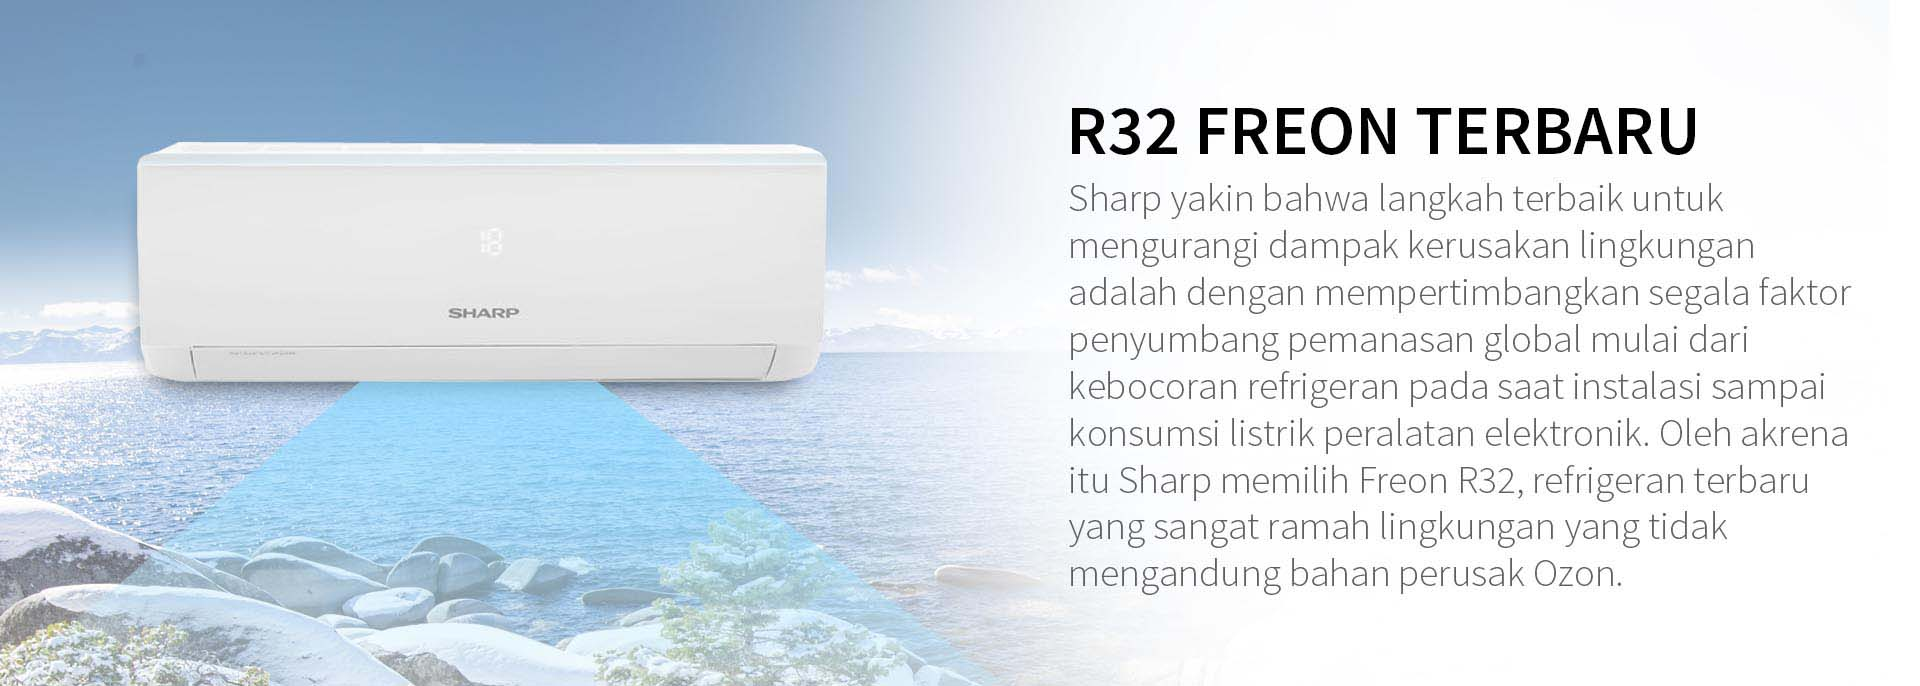 R32%20Freon%20ucy_0.jpg